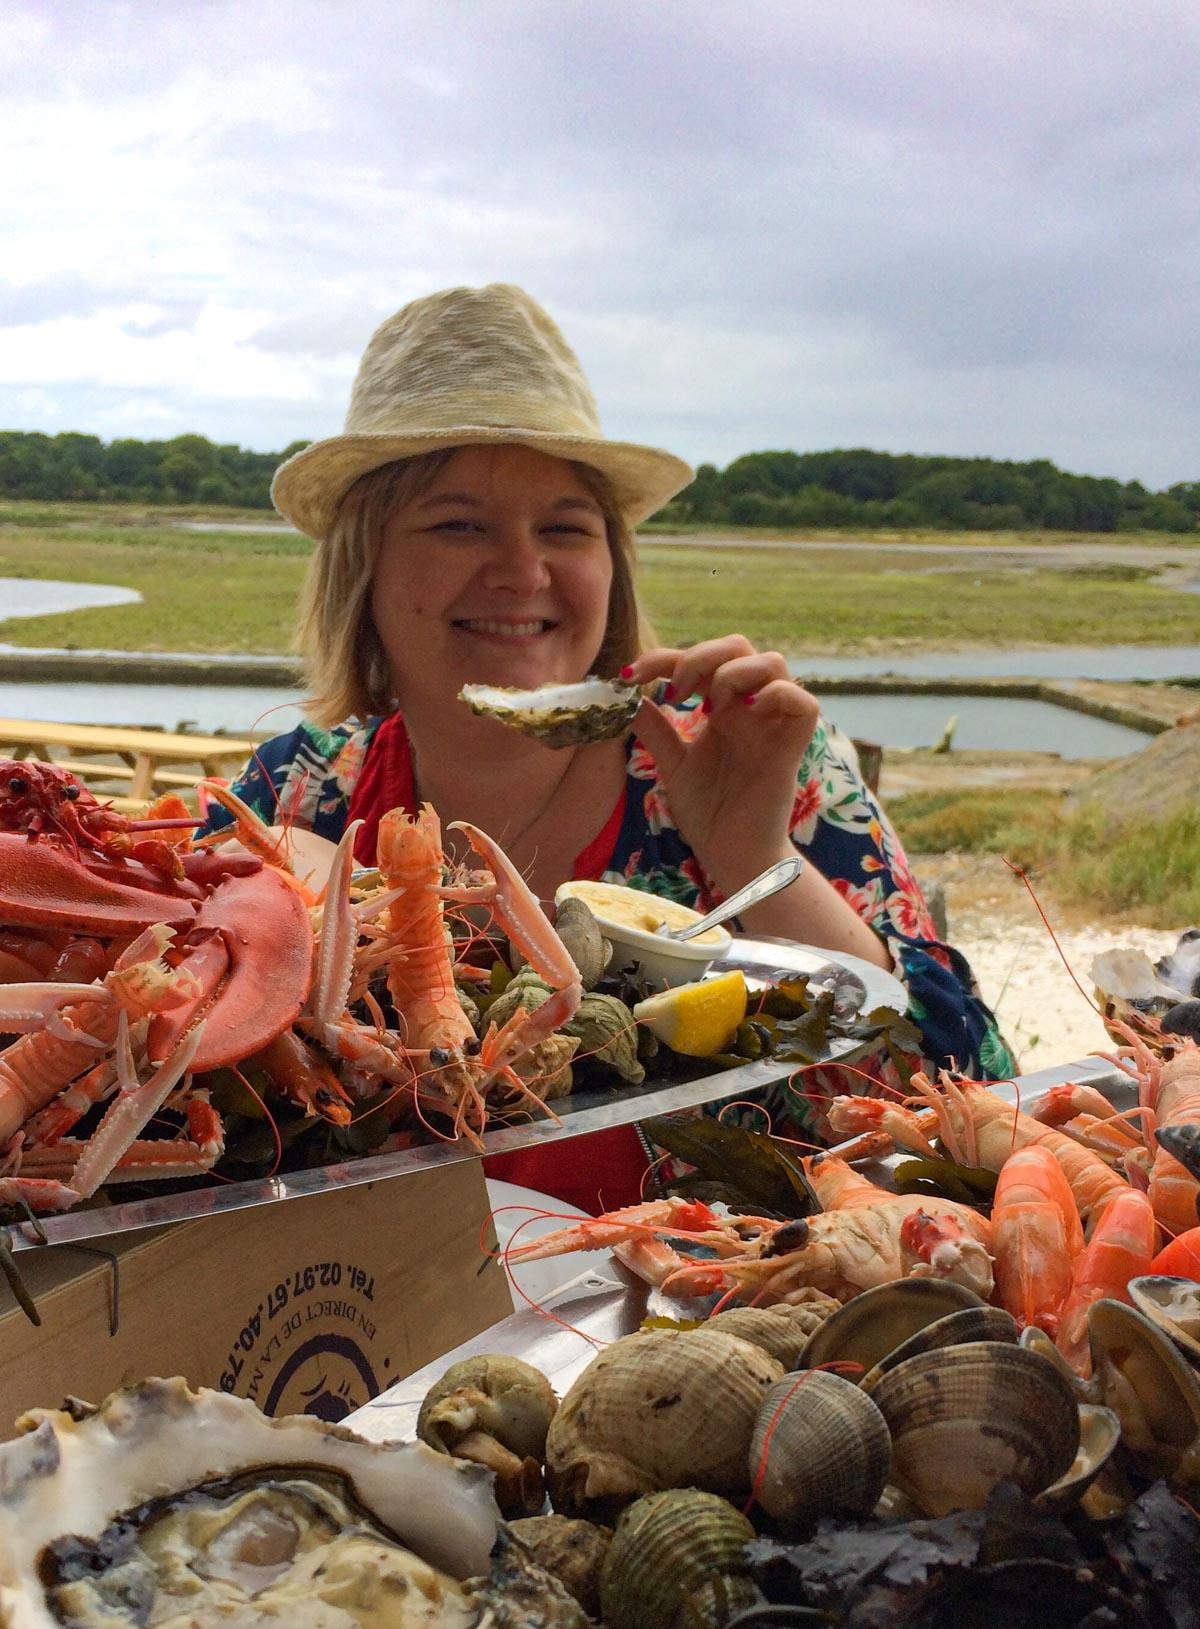 Marie-Catherine qui mange un plateau de fruits de mer, Morbihan, Bretagne